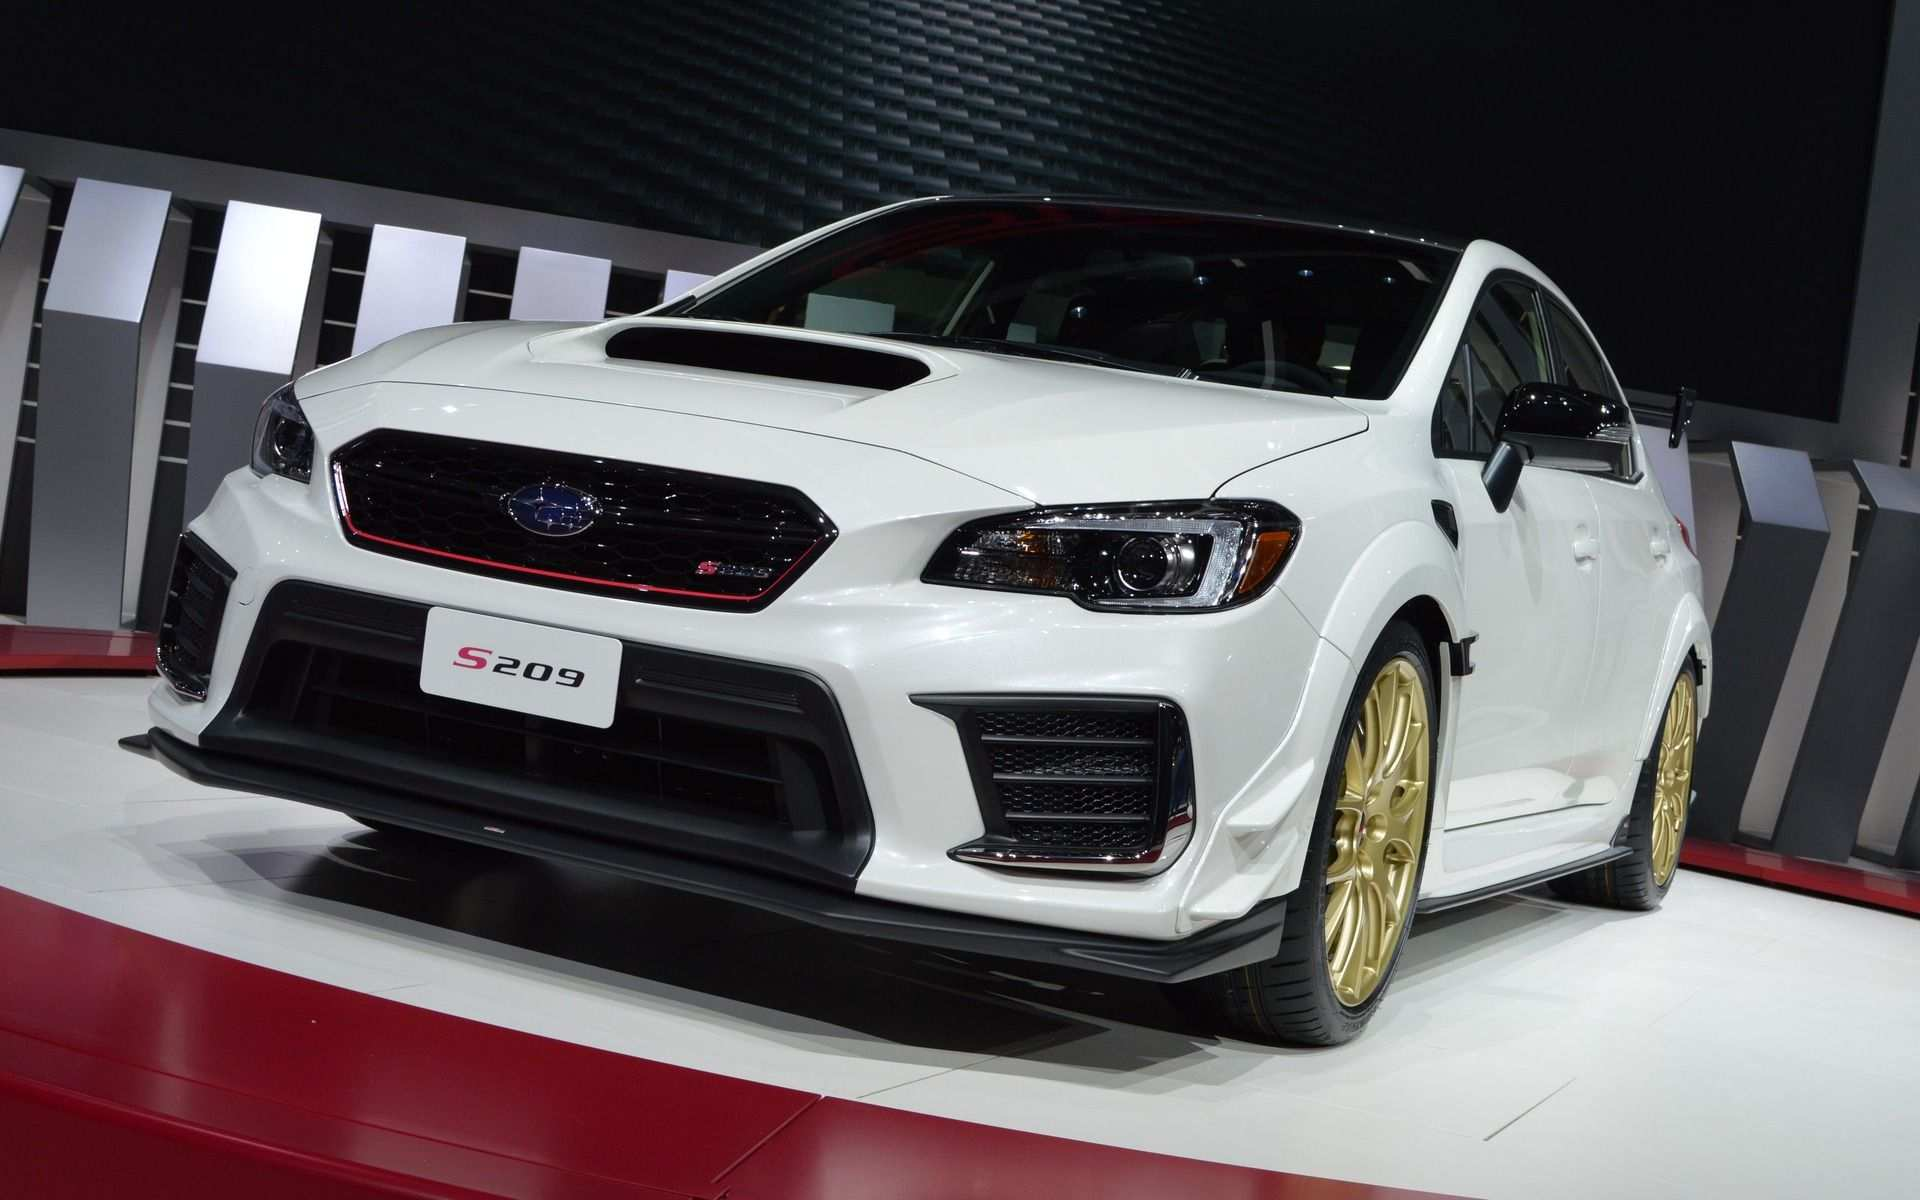 87 All New 2020 Subaru Raiu Performance and New Engine with 2020 Subaru Raiu